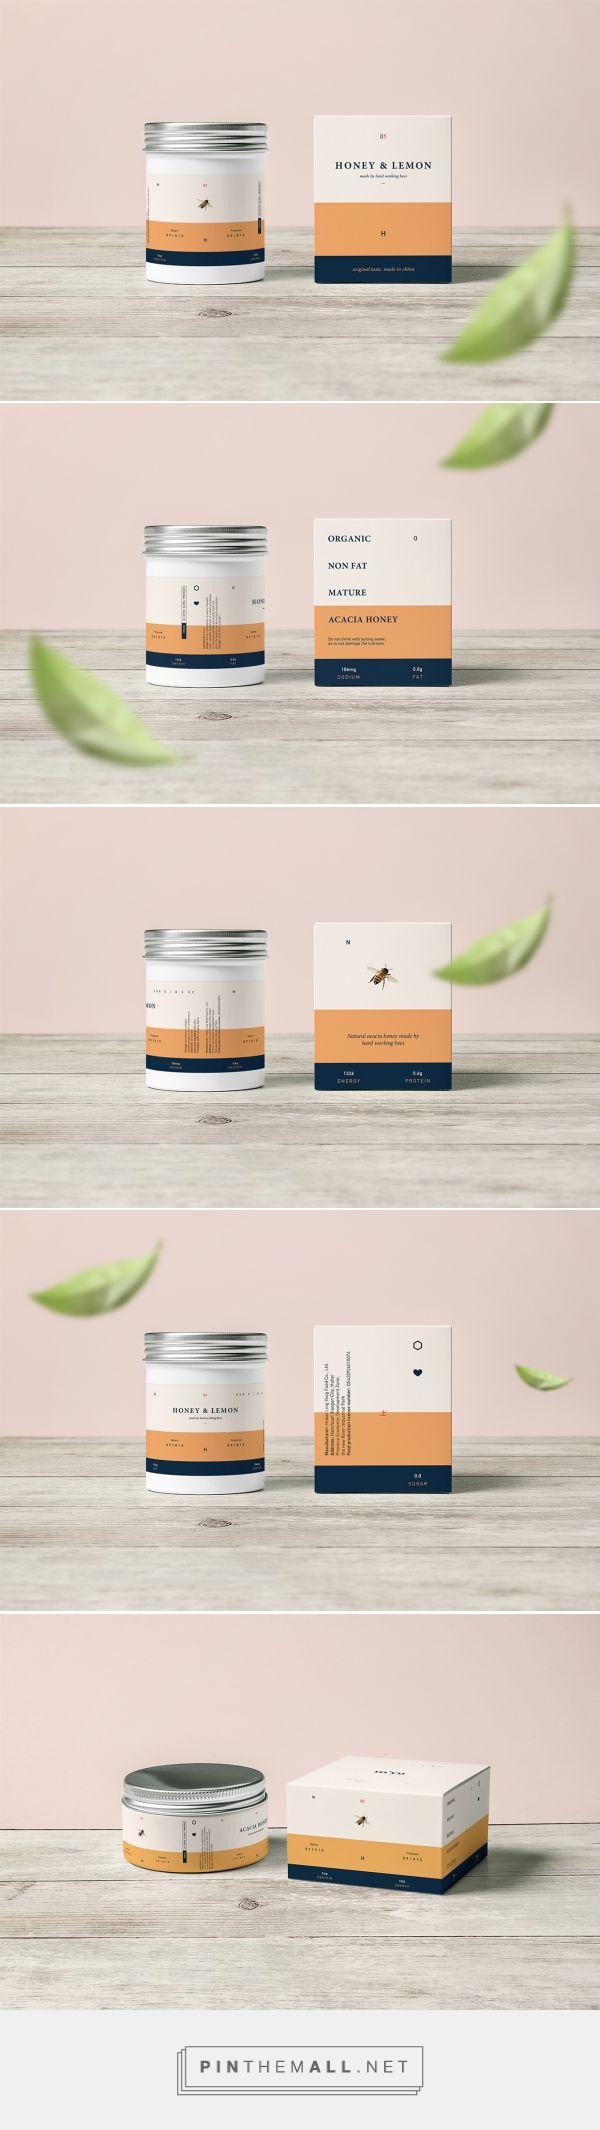 Best Tea Packaging Ideas On Pinterest Tea Packing Design - 18 brilliant packaging designs